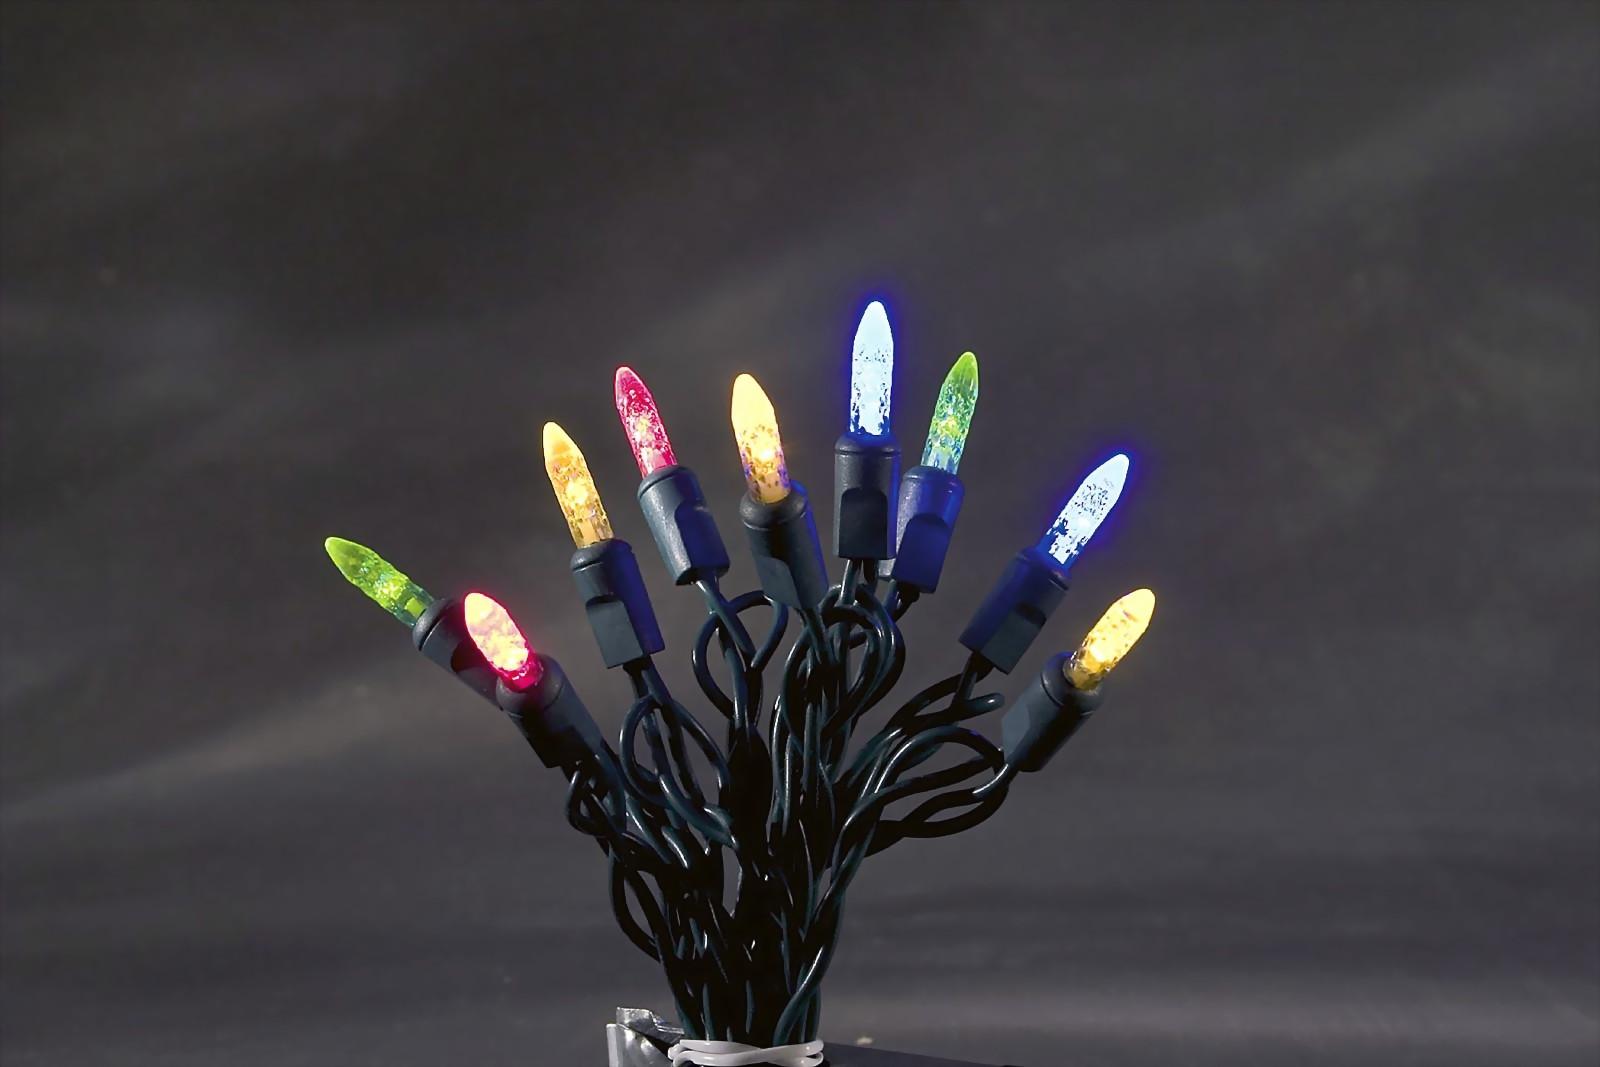 bunte led lichterkette bunte led farbige led lichterkette bunte lichterkette. Black Bedroom Furniture Sets. Home Design Ideas